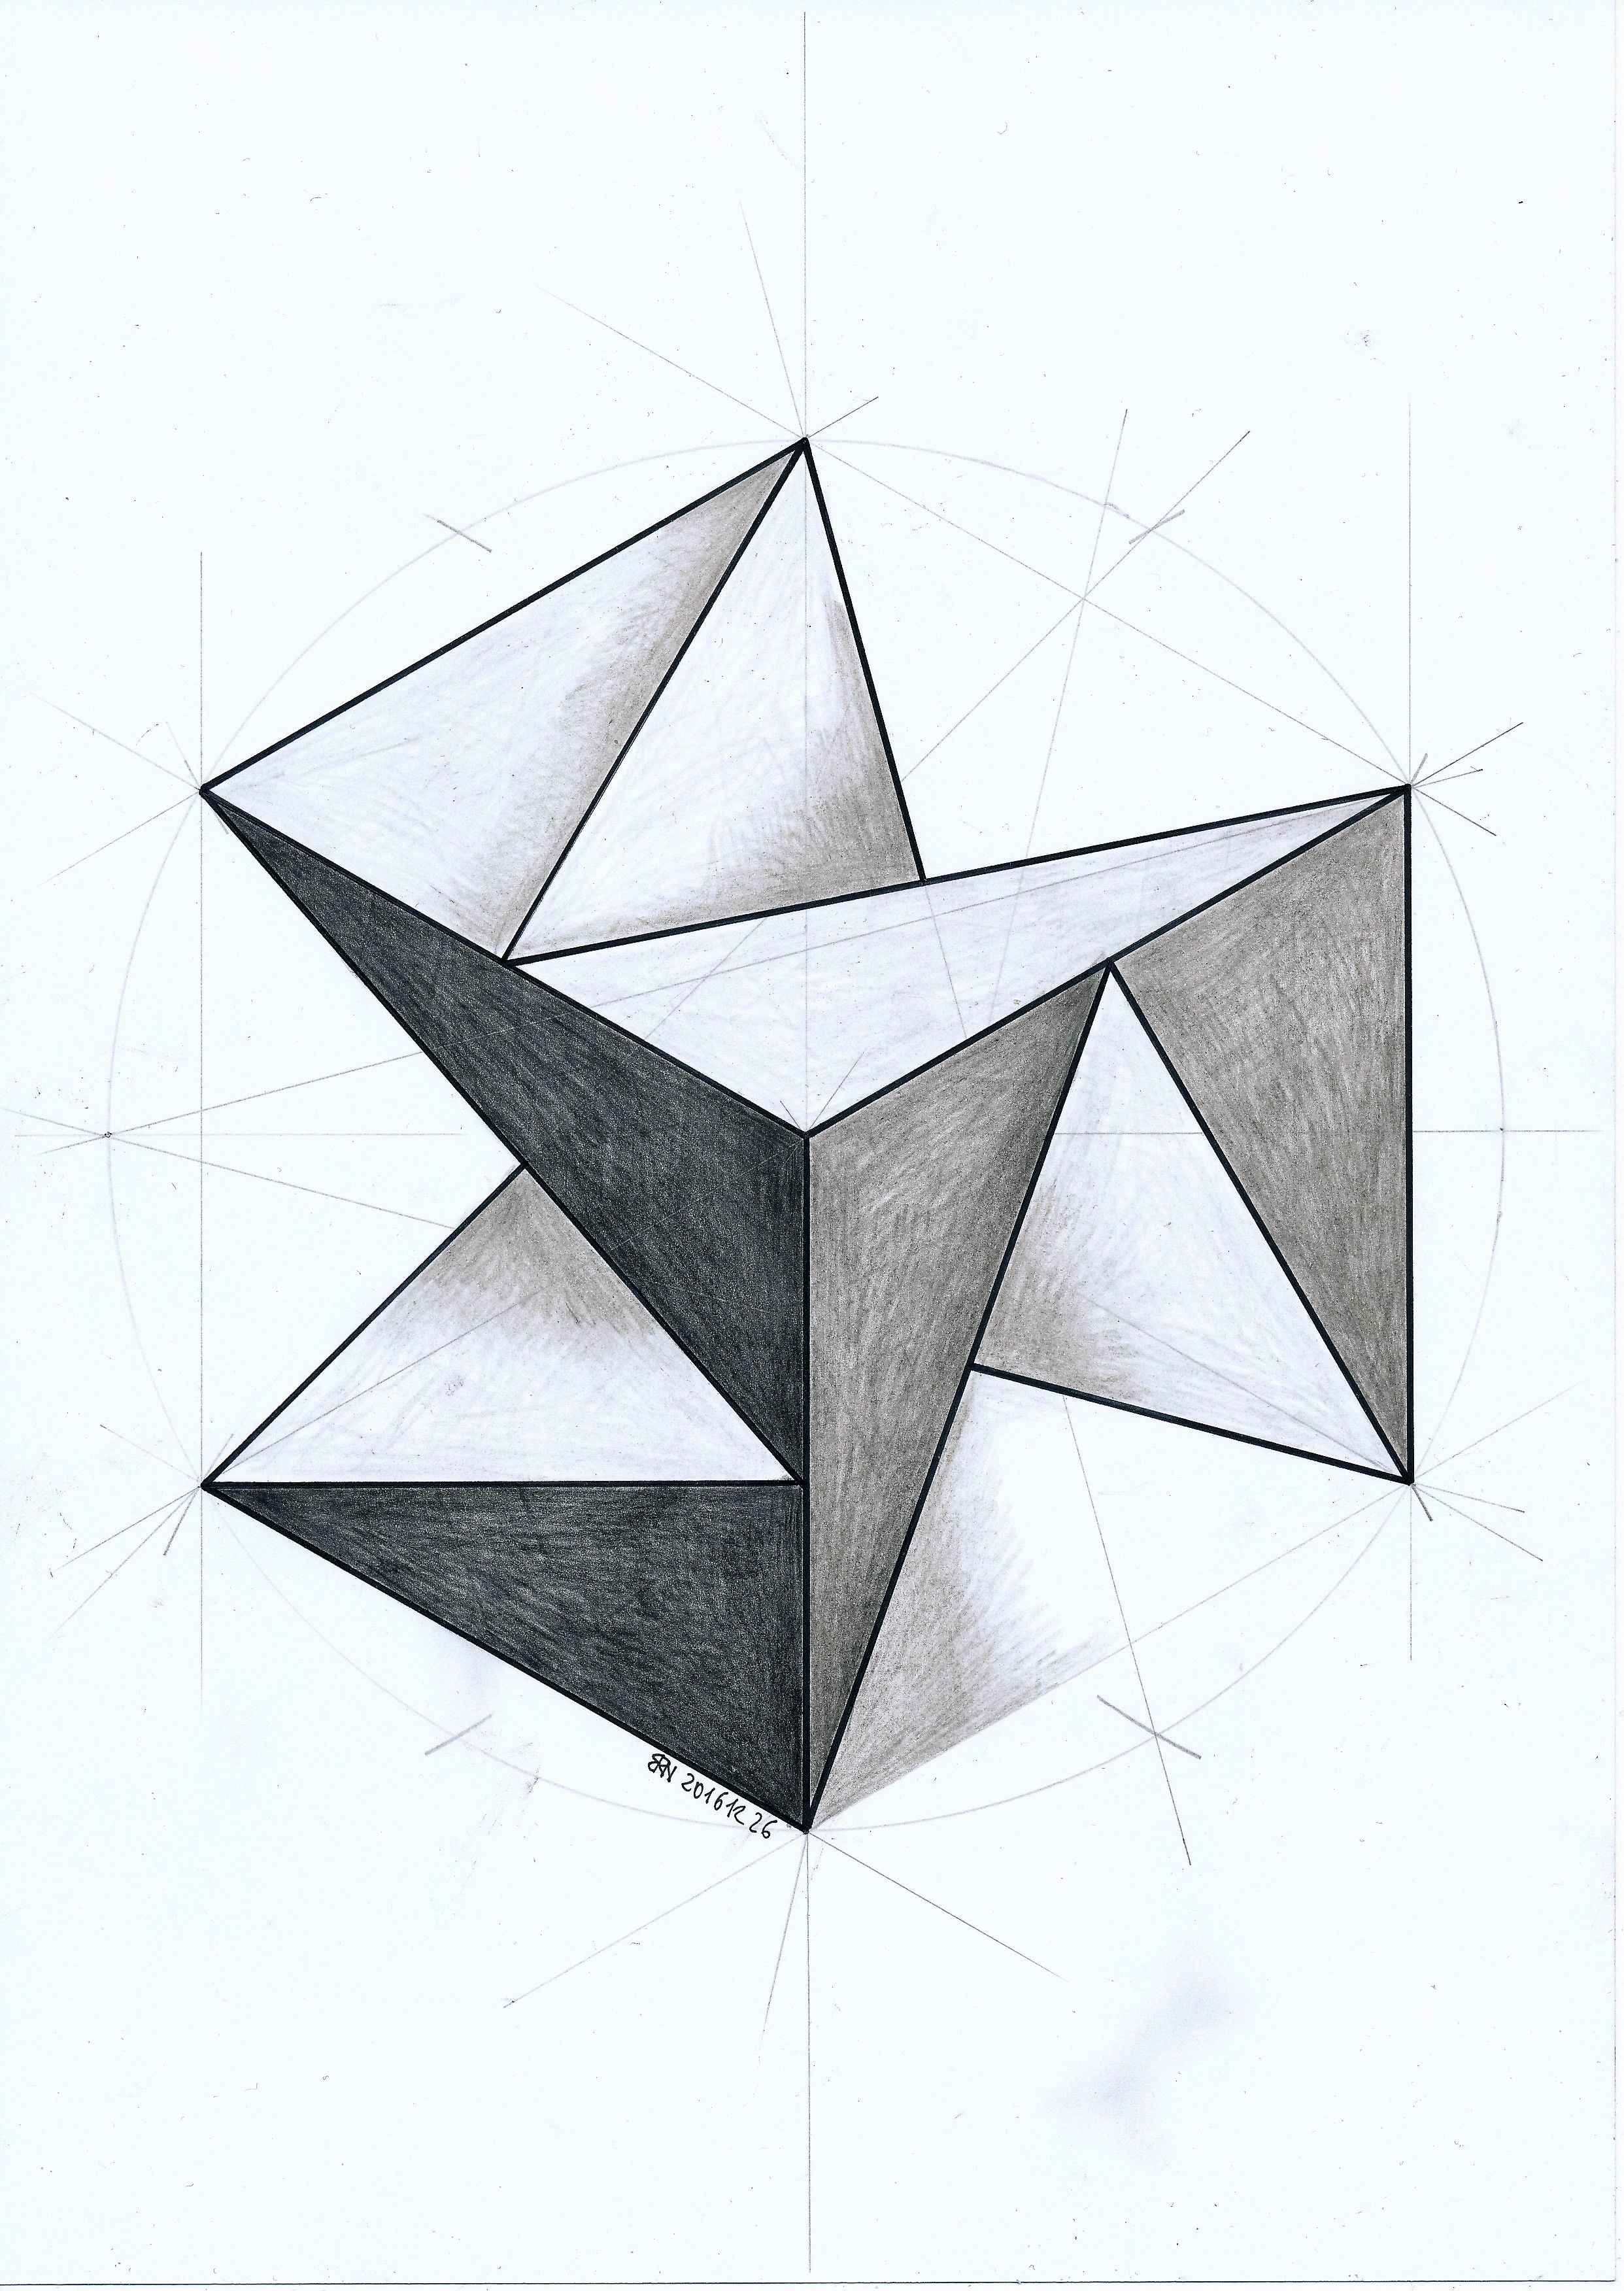 Polyhedra Solid Geometry Symmetry Pattern Handmade Escher